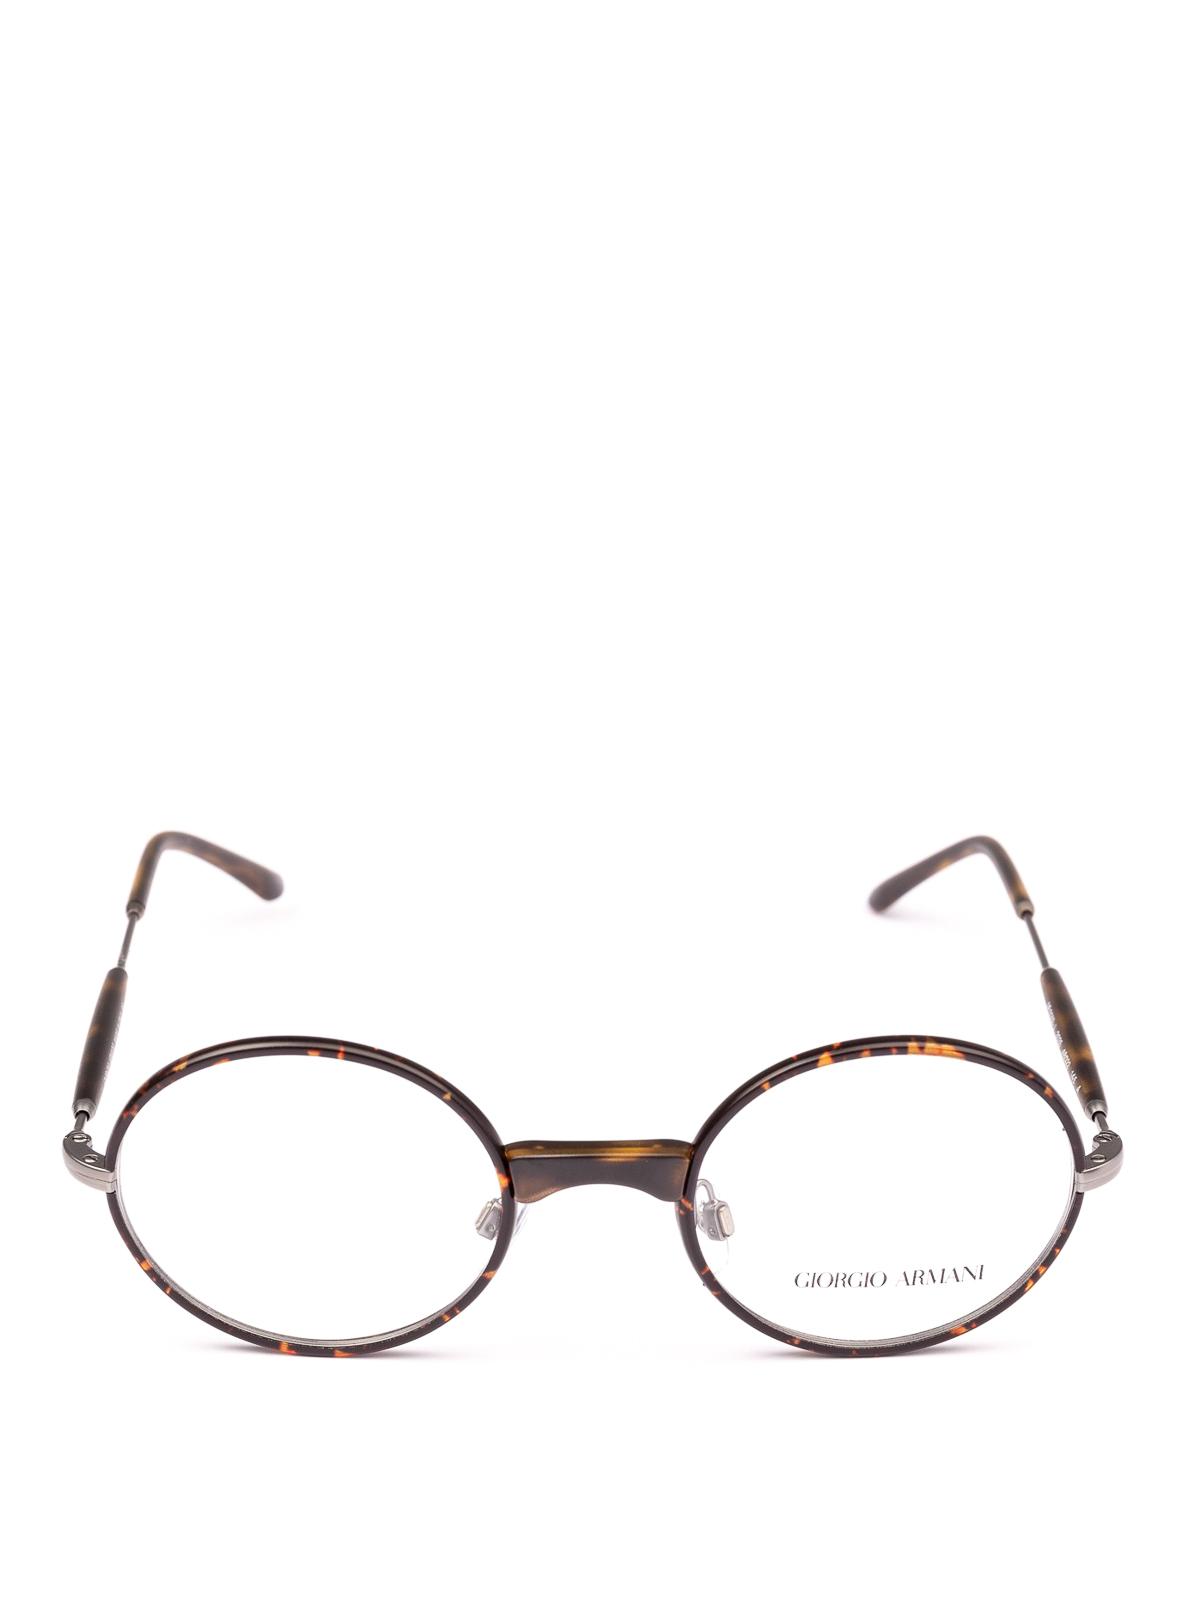 7a05fb4b5d8d GIORGIO ARMANI: Glasses online - Havana slender frame oval eyeglasses